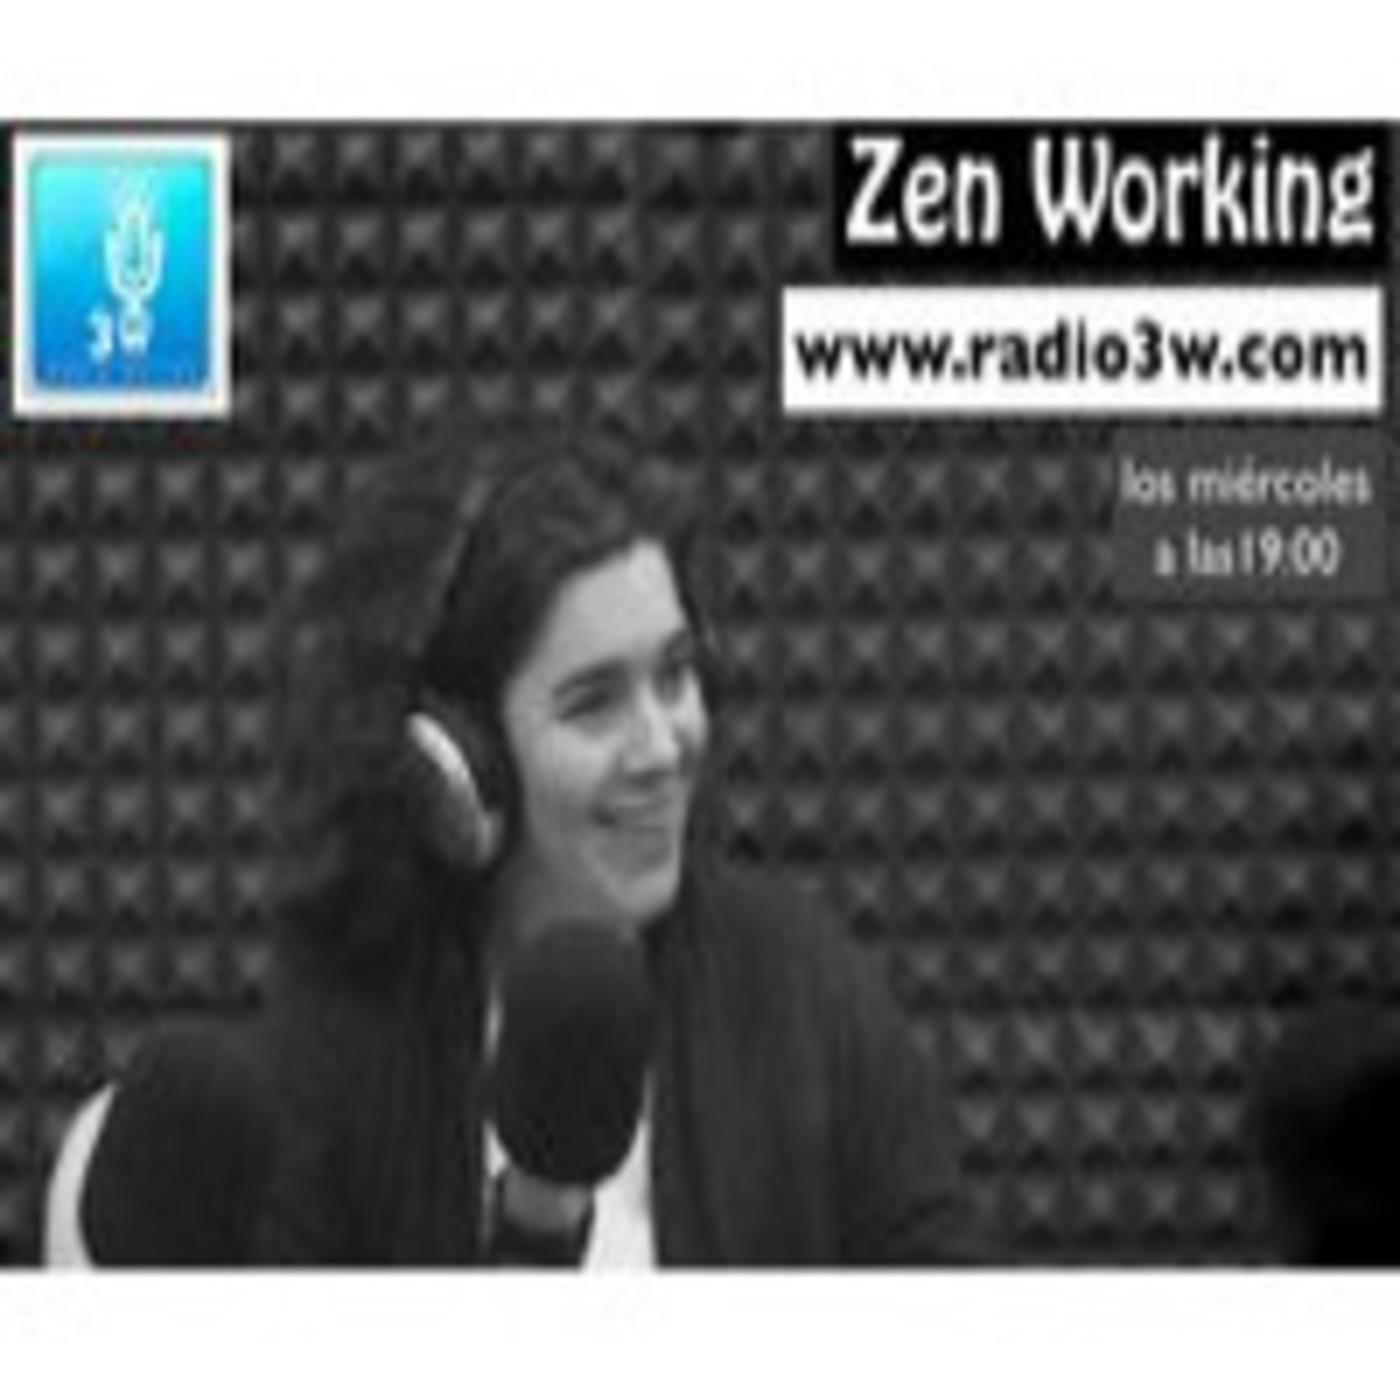 <![CDATA[Zen Working]]>